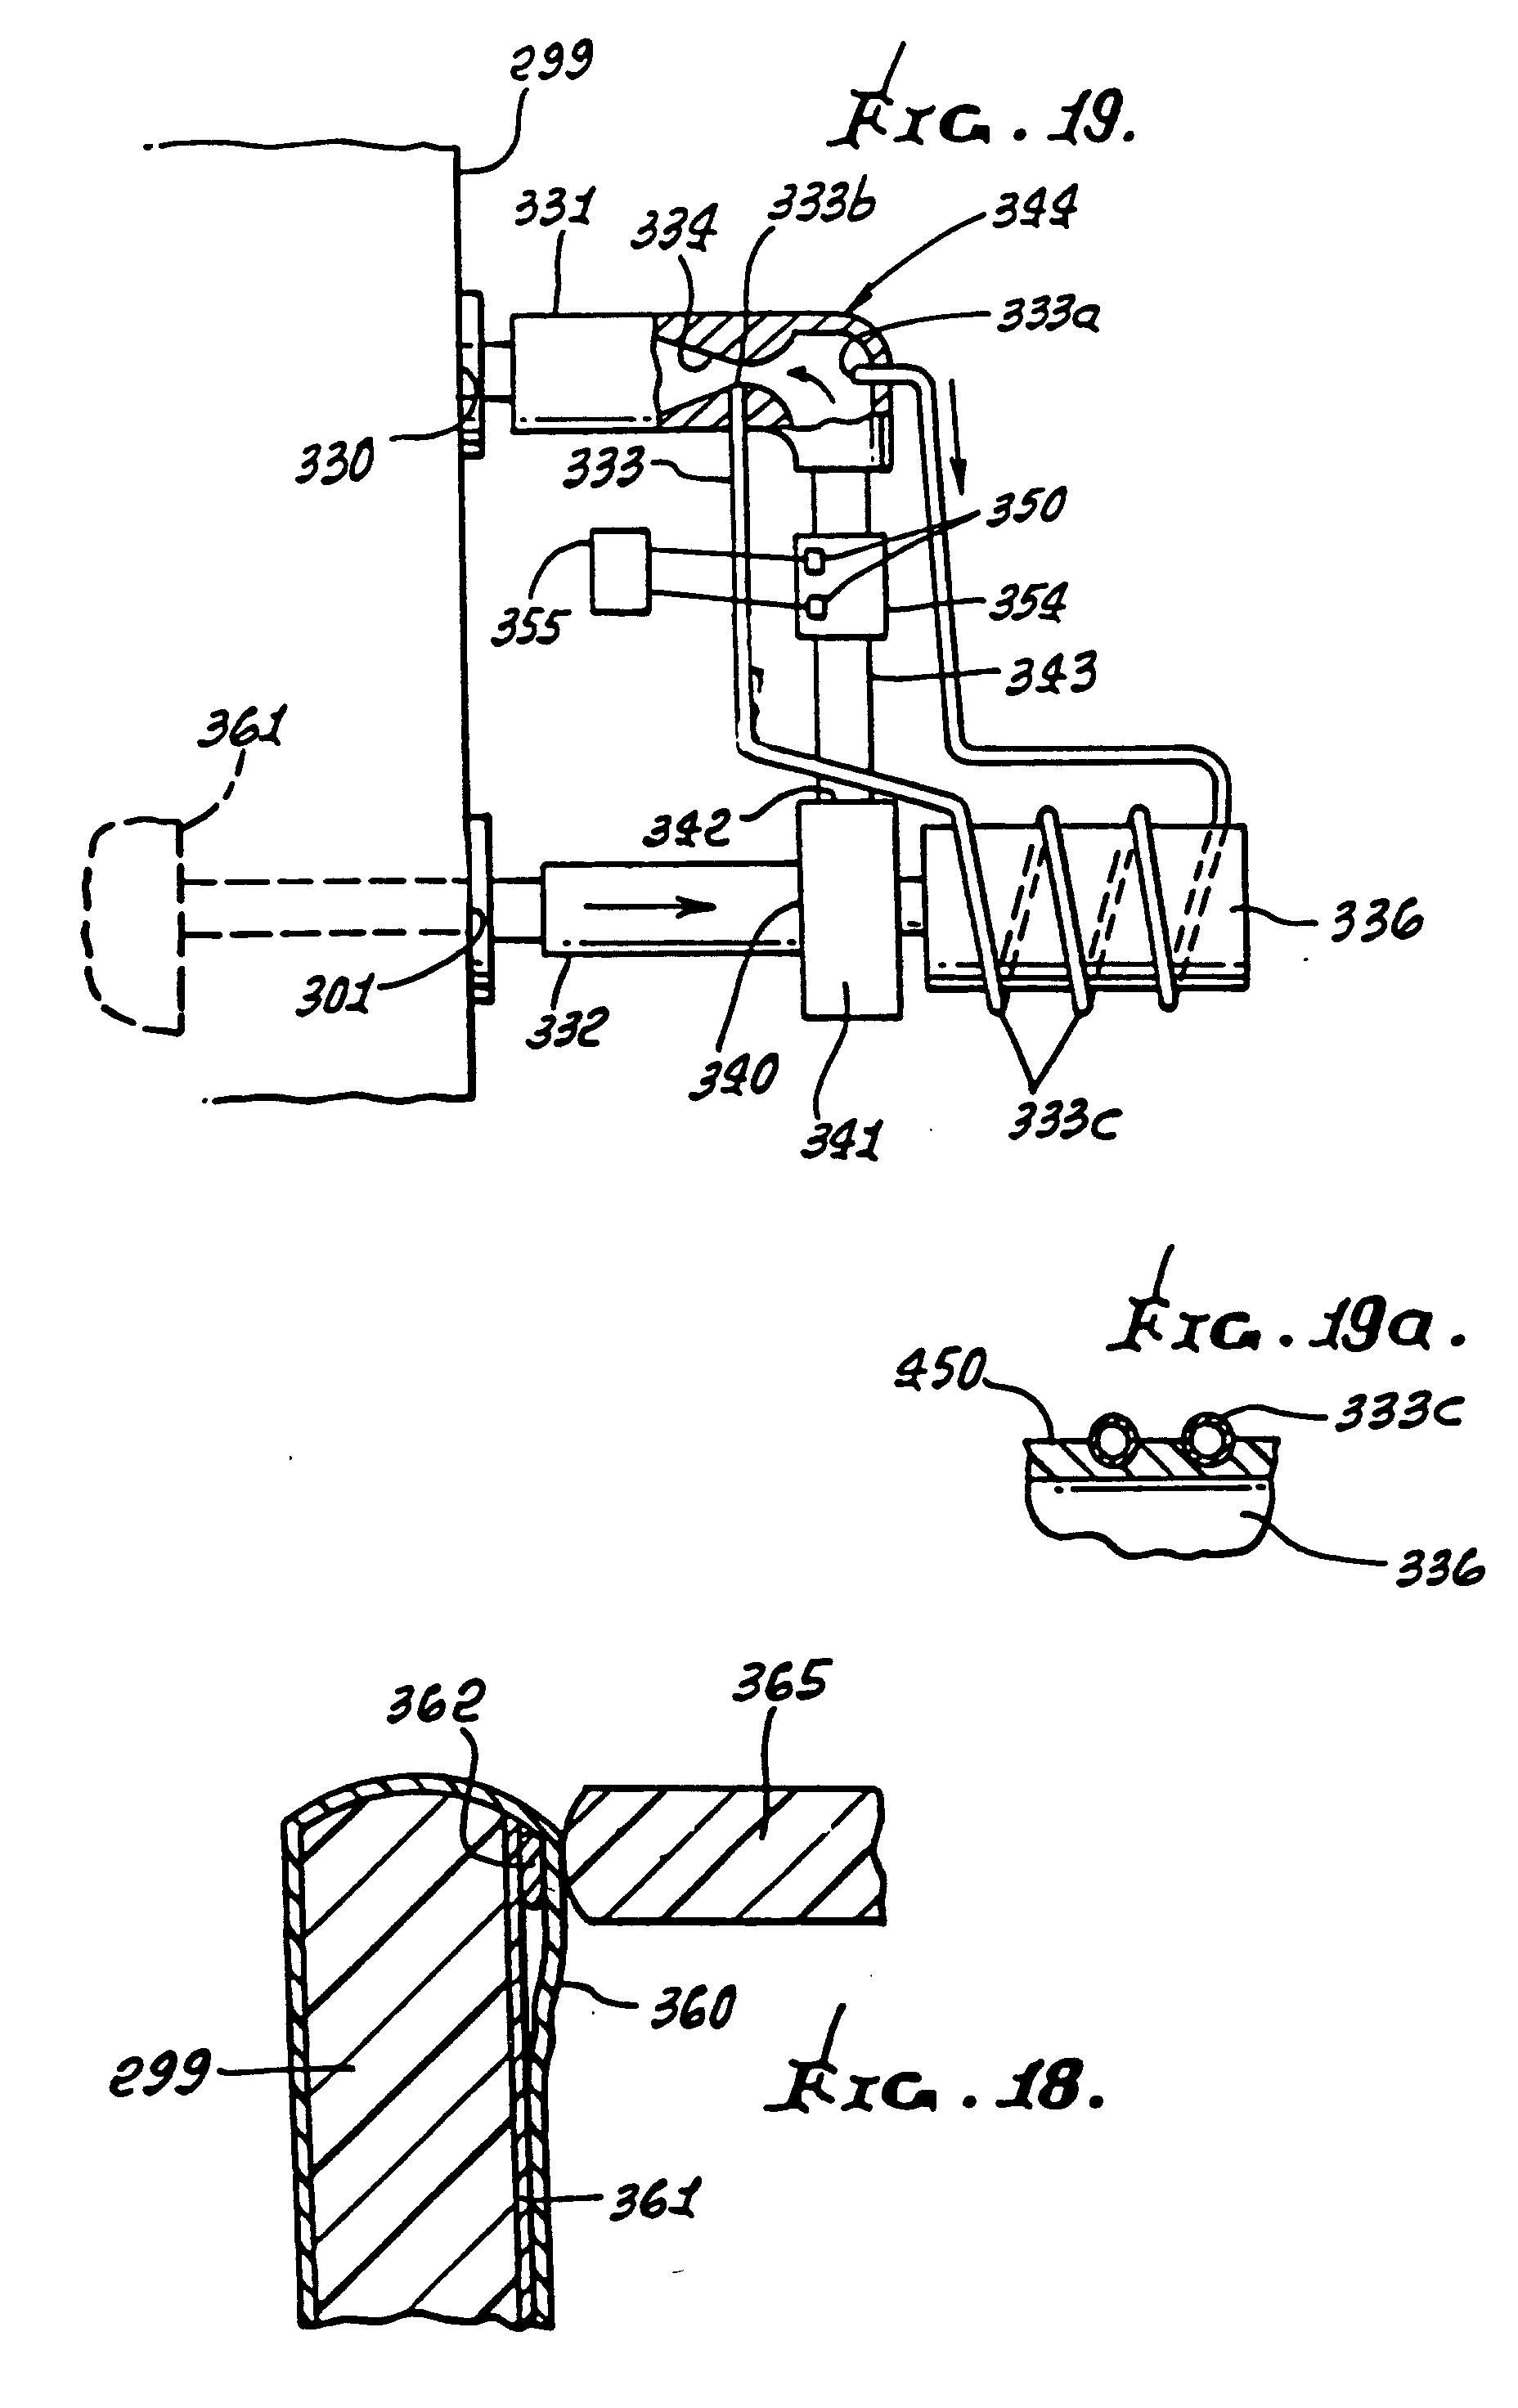 softub motor diagram - pokemon go search for: tips, tricks ... starter motor diagram 2003 nissan 350z car to starter motor softub motor diagram